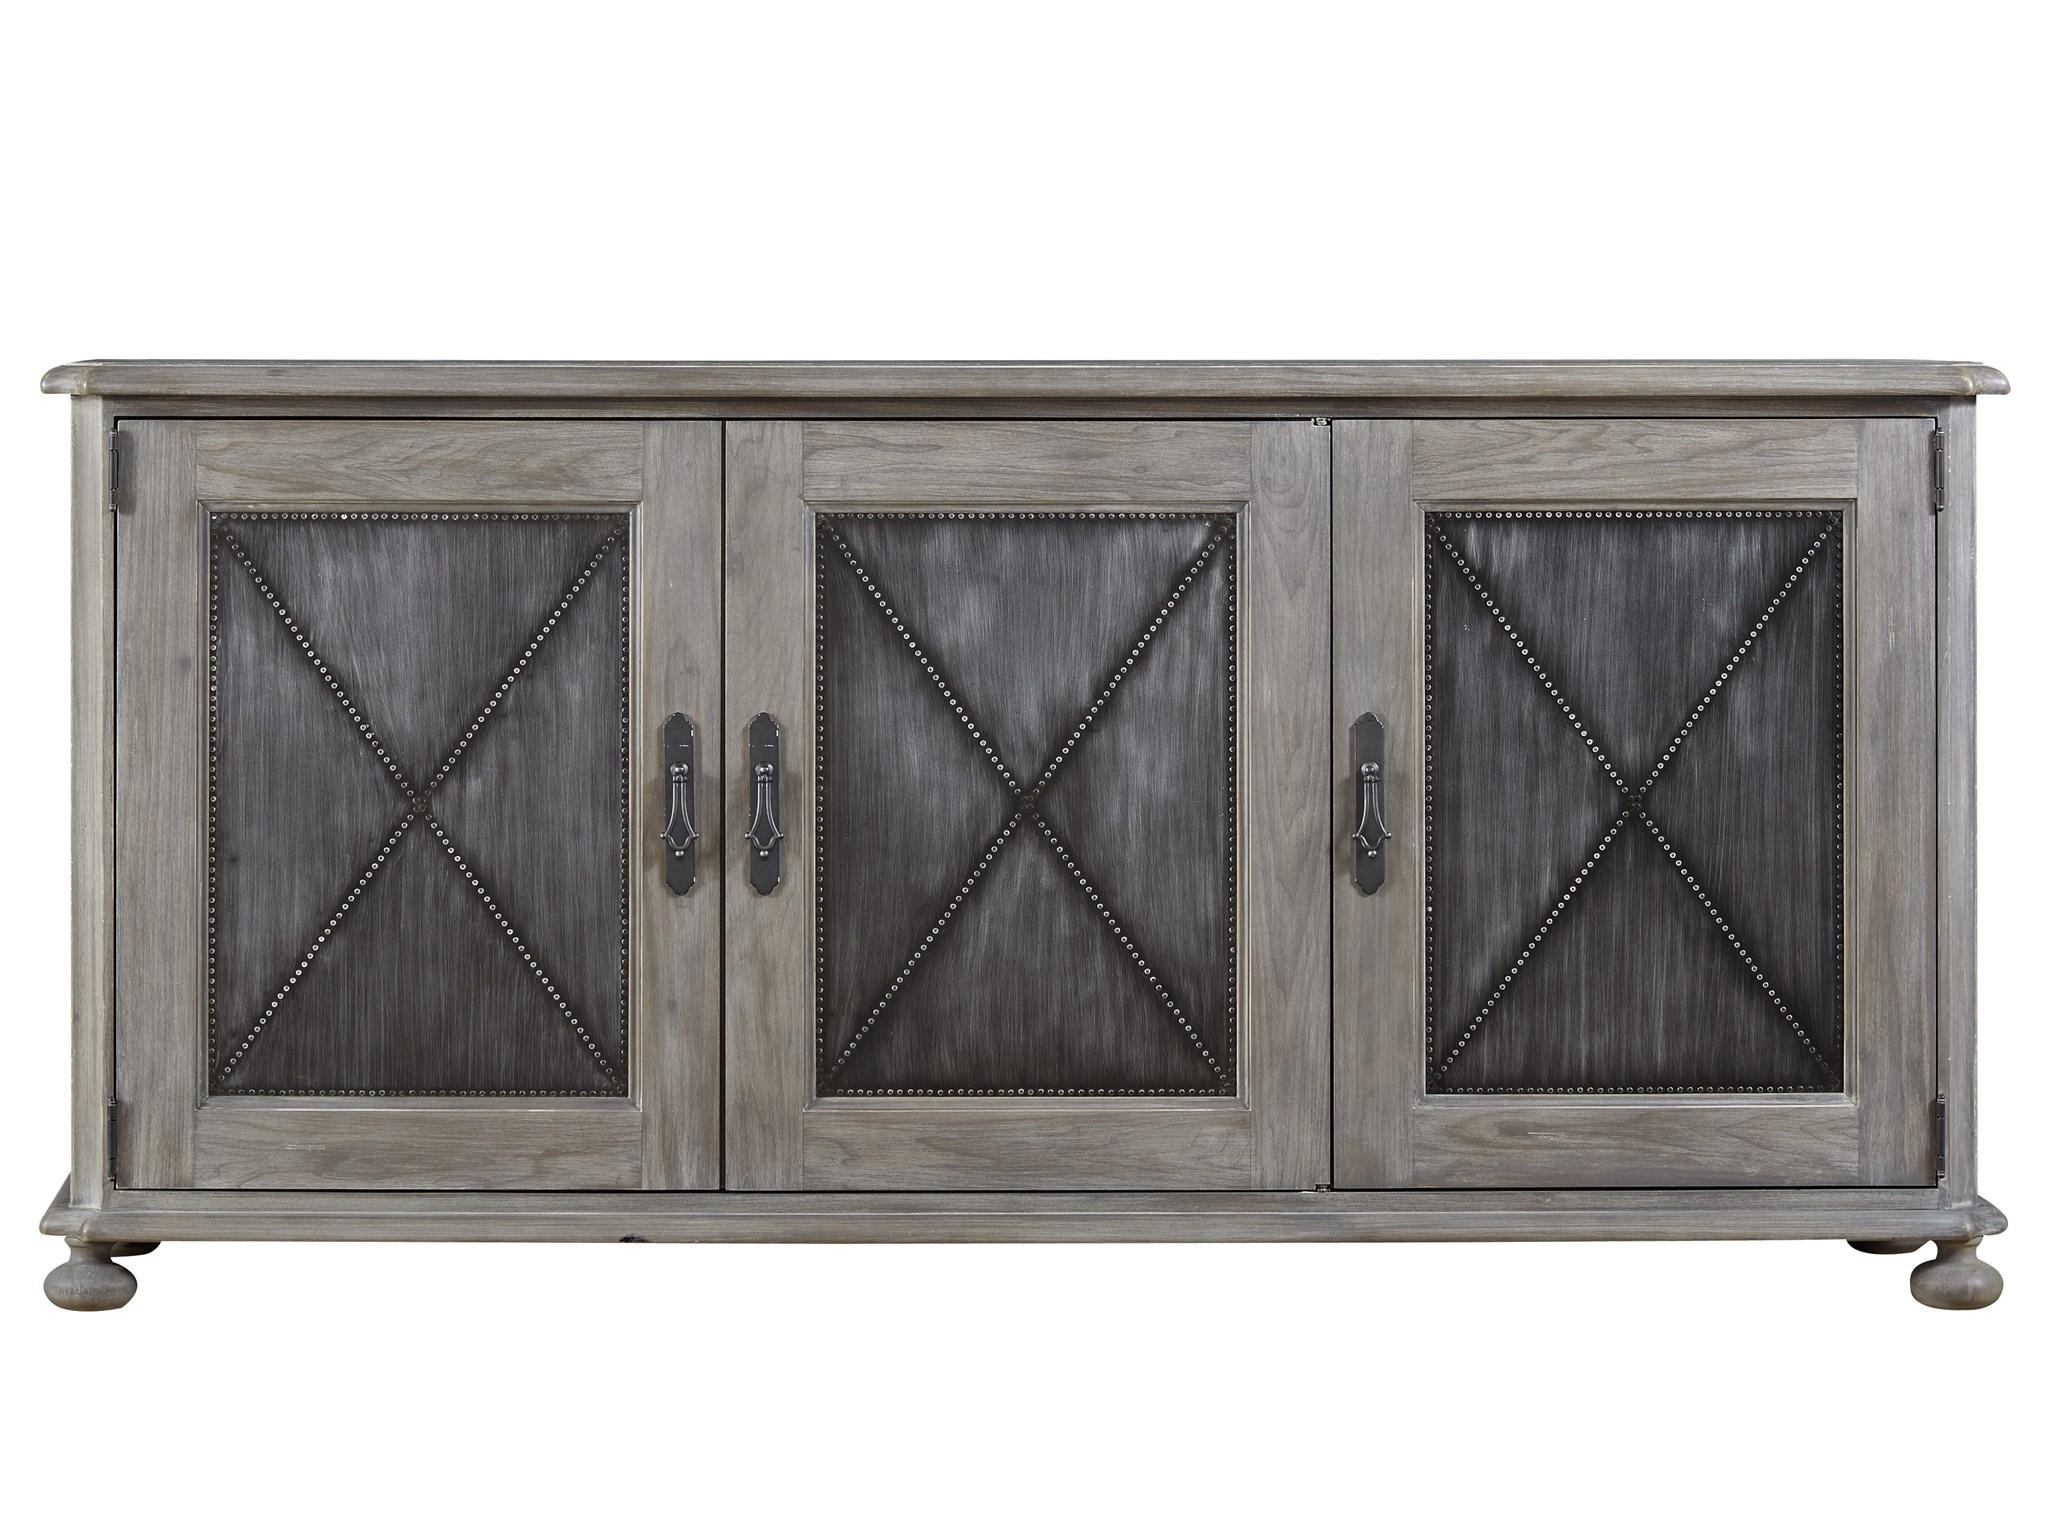 Glenmore Sideboard